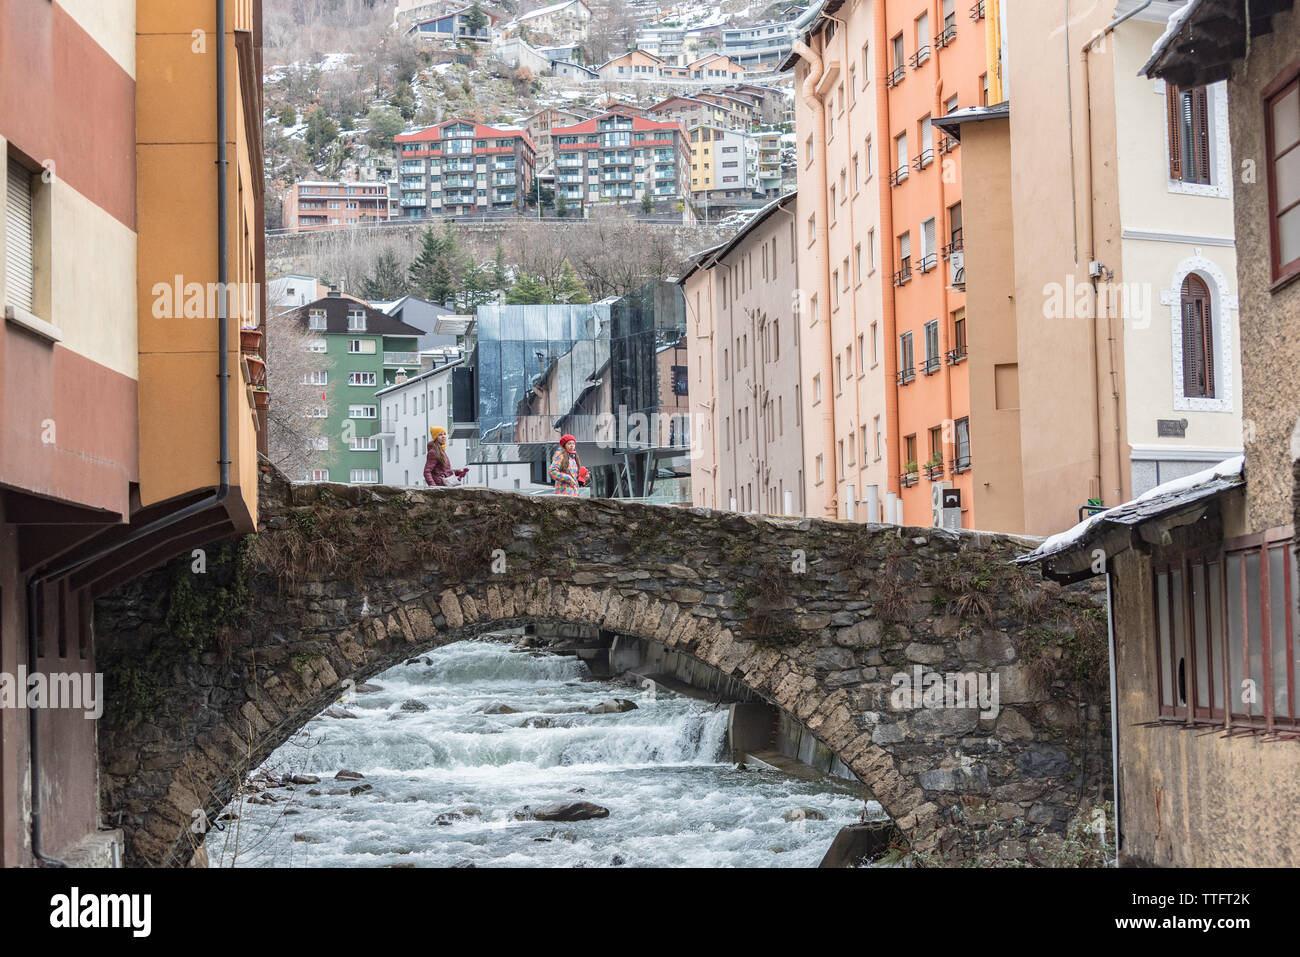 ESCALDES-ENGORDANY, ANDORRA - February 1: River Valira on Engordany Br Stock Photo